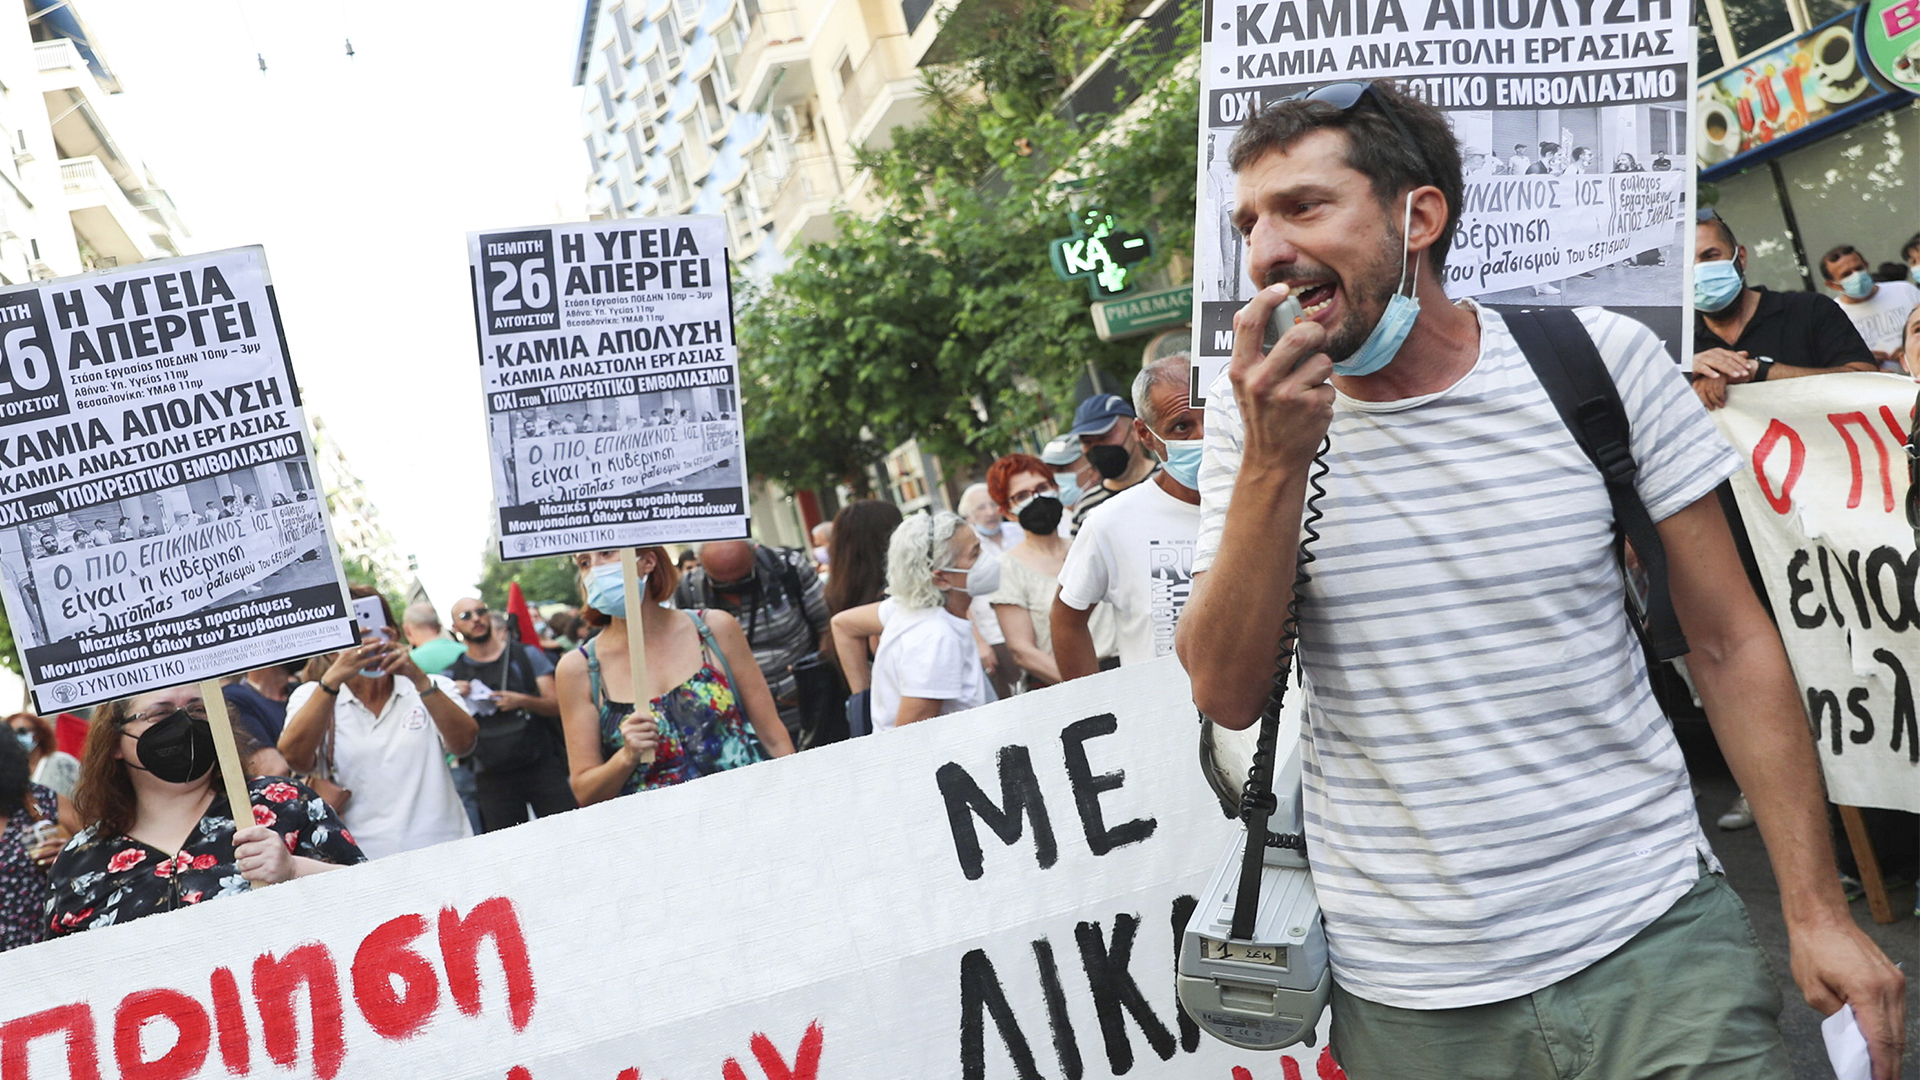 Медики Греции вышли на протест против обязательной вакцинации